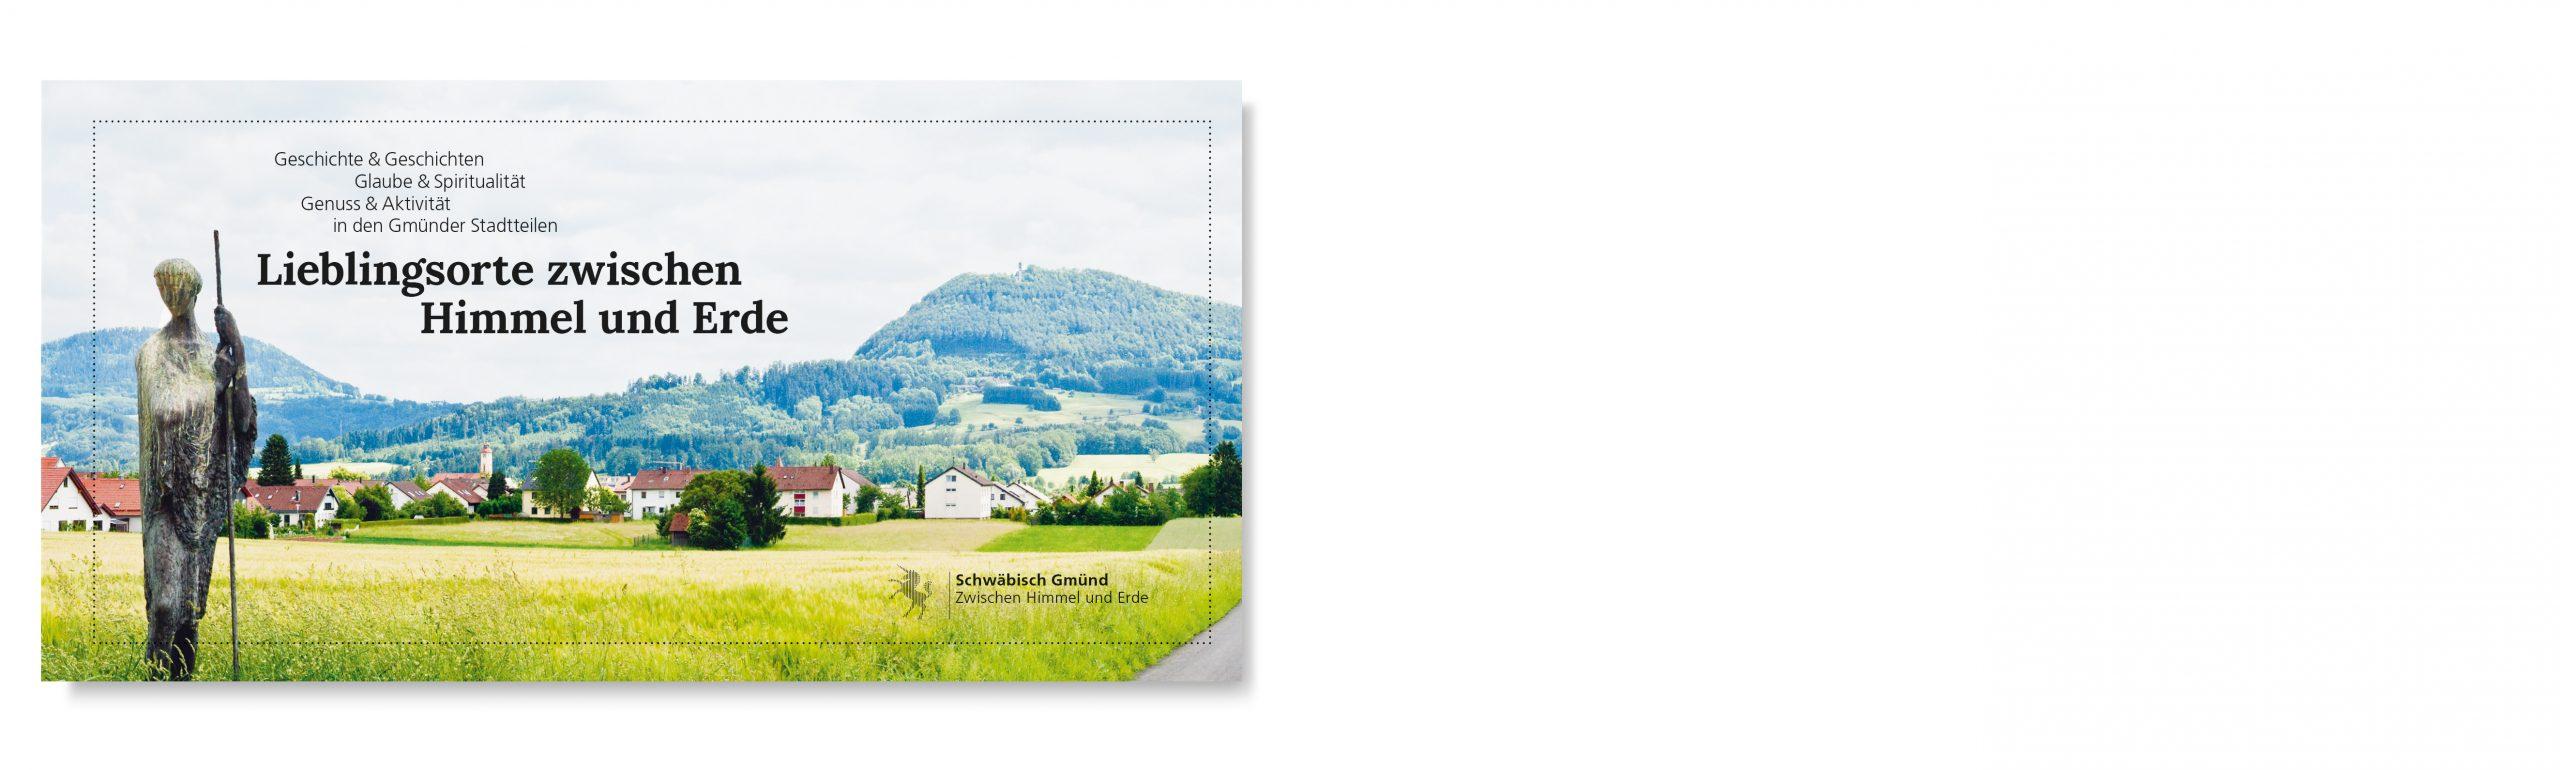 fh-web-broschuere-lieblingsorte-titel-scaled.jpg